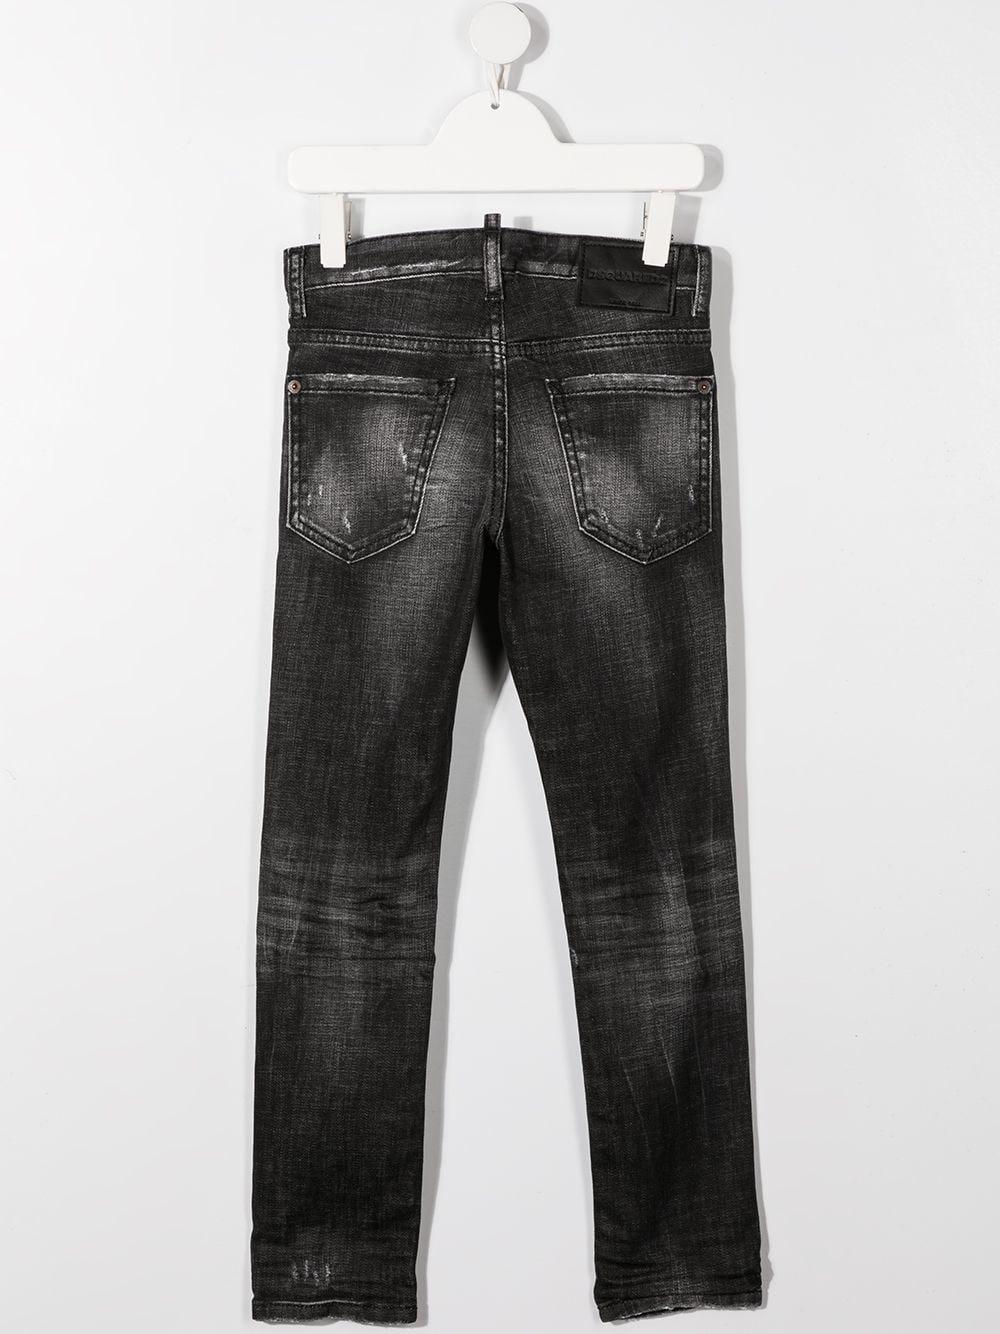 jeans nero DSQUARED KIDS | Jeans | D2P31BLVMDQ0234D004ZDQ02#